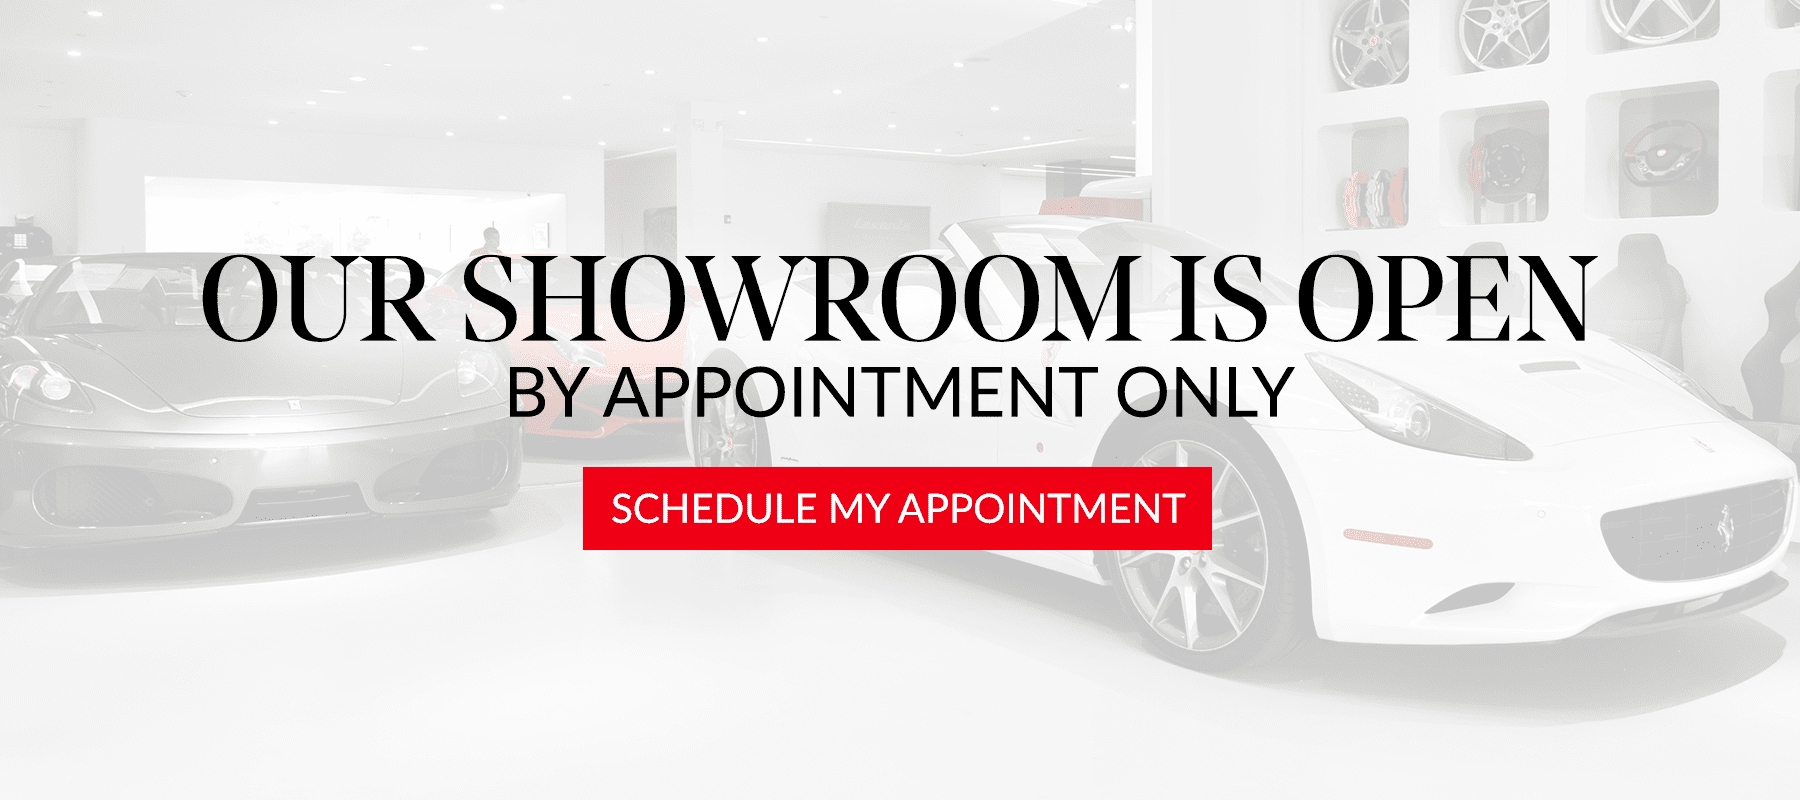 6442-showroom